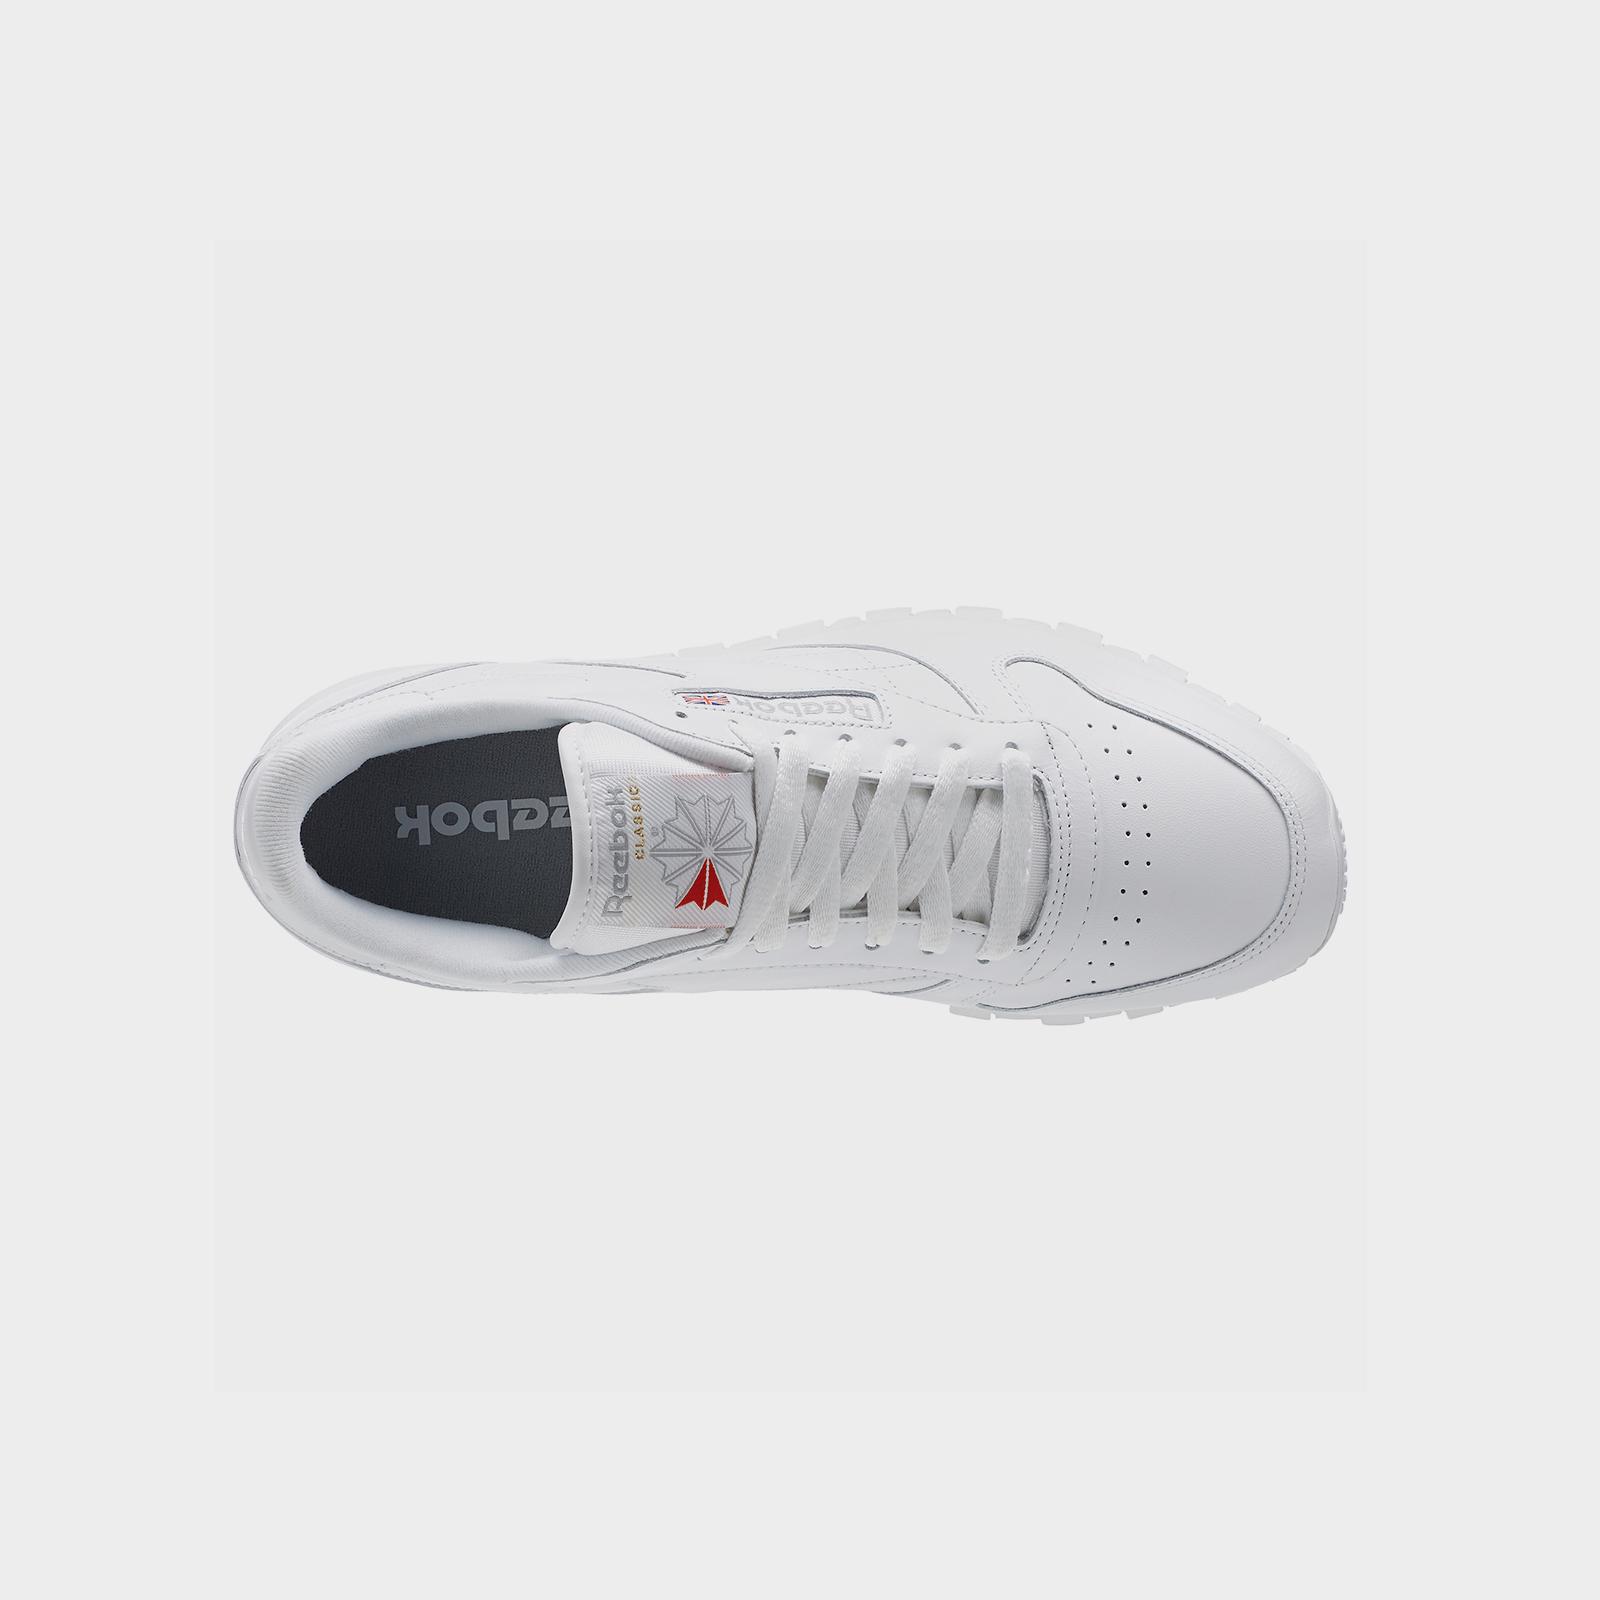 2dd96ff7d847d Reebok Classic Leather - 9771 - Sneakersnstuff